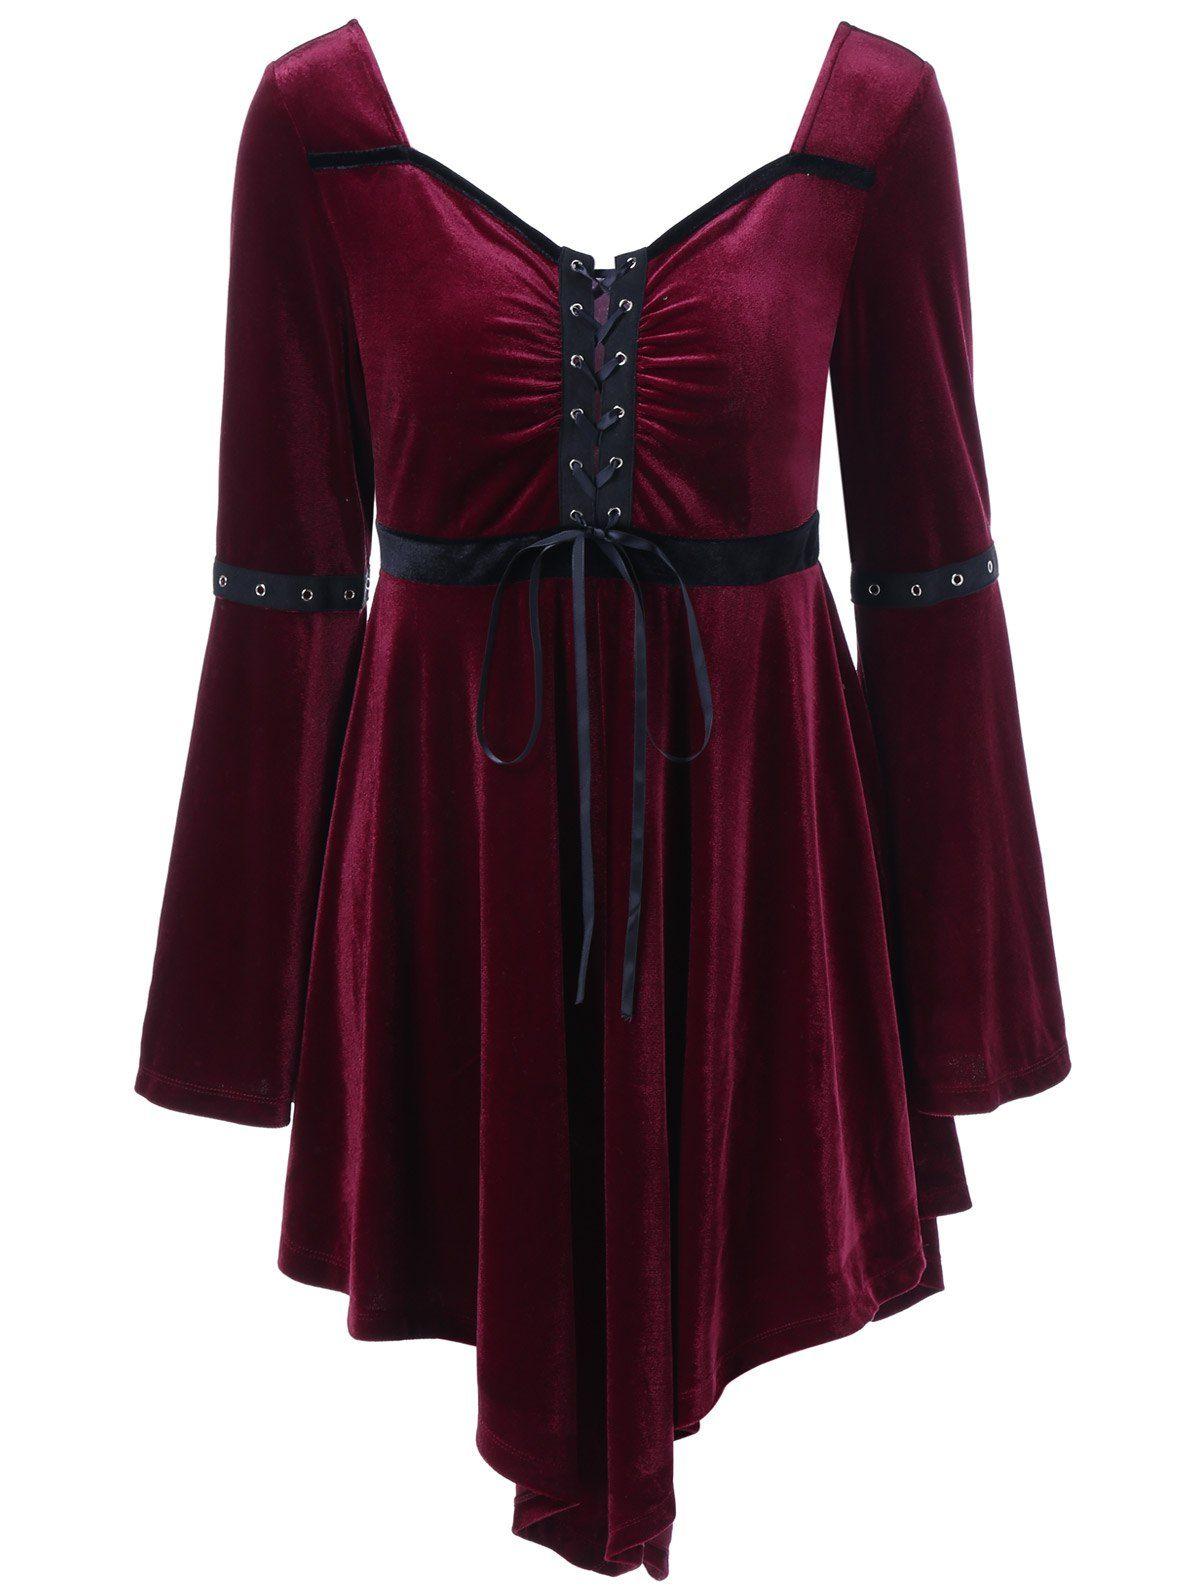 Plus Size Asymmetrical Velvet Vintage Dress Vintage Dresses